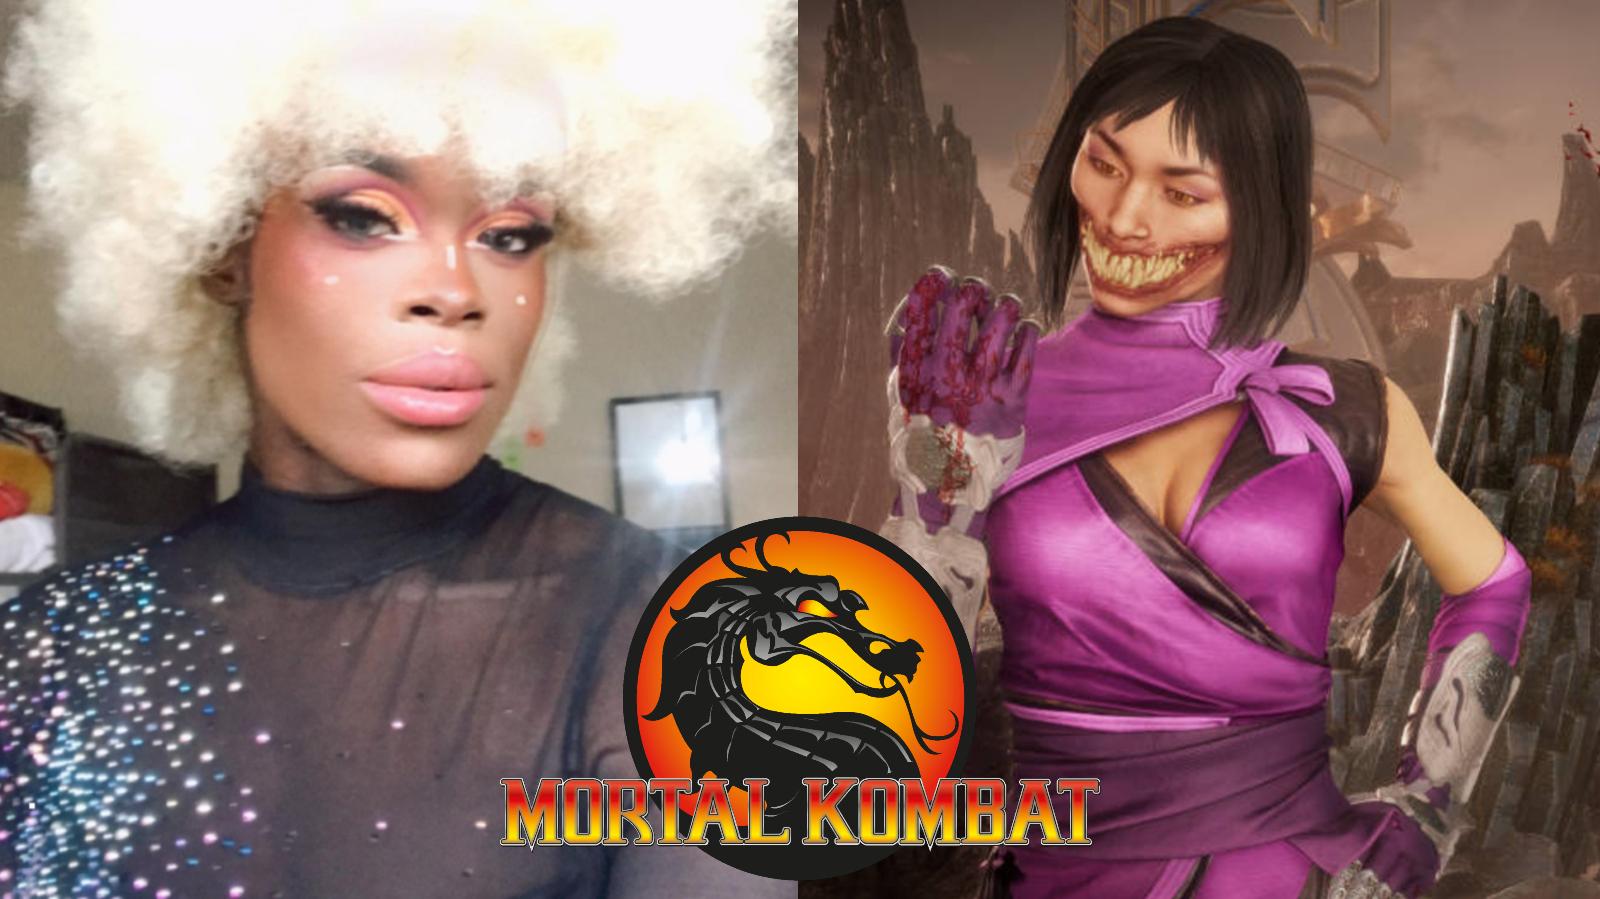 Mileena Mortal Kombat Cosplay by Asttina Mandella RuPaul's Drag Race UK